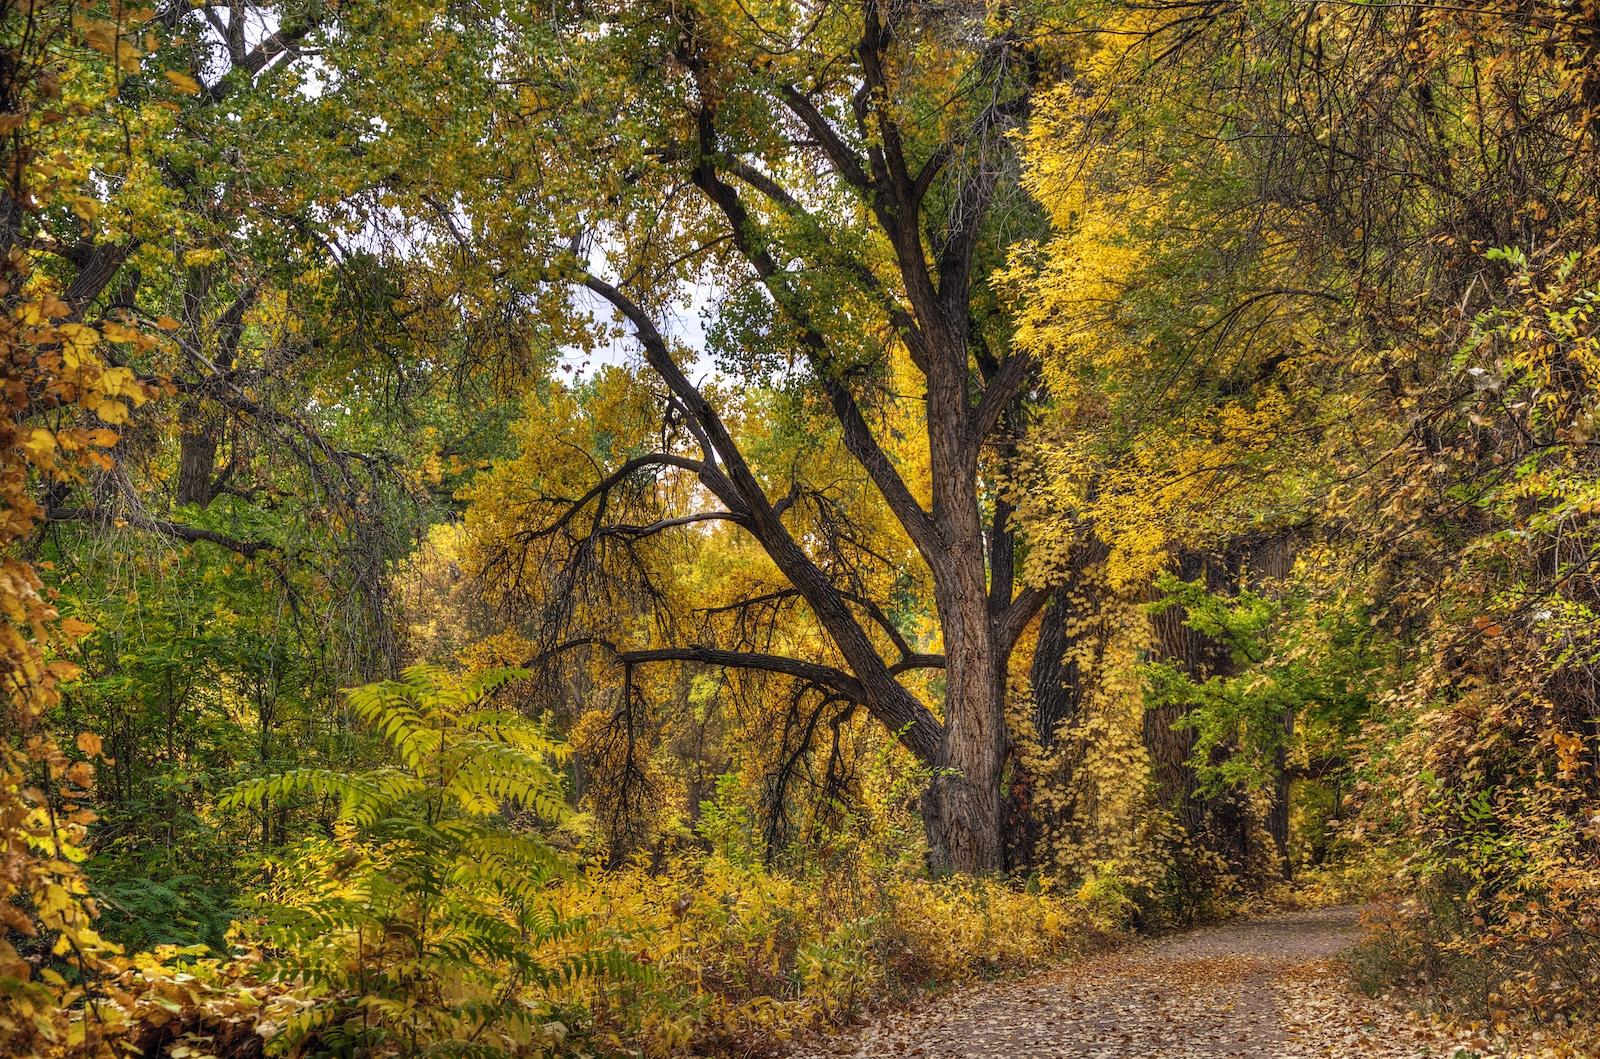 Arkansas Riverwalk Trail Canon city, CO